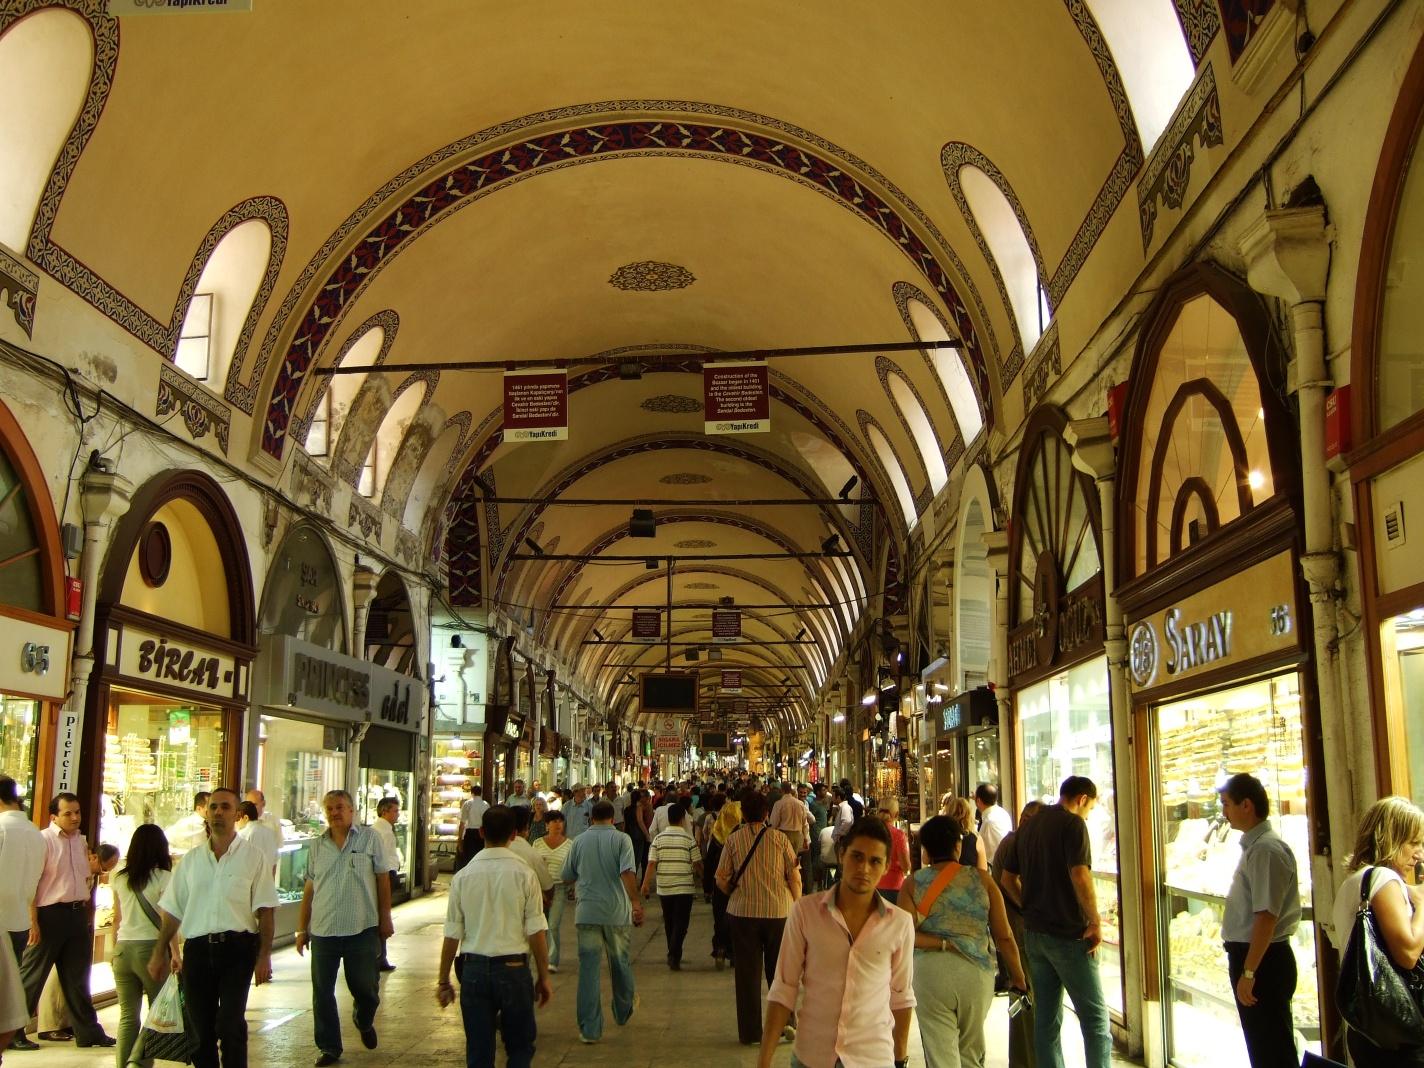 File:Kapali Carsi-Grand Bazar-Istanbul-Sep08.jpg